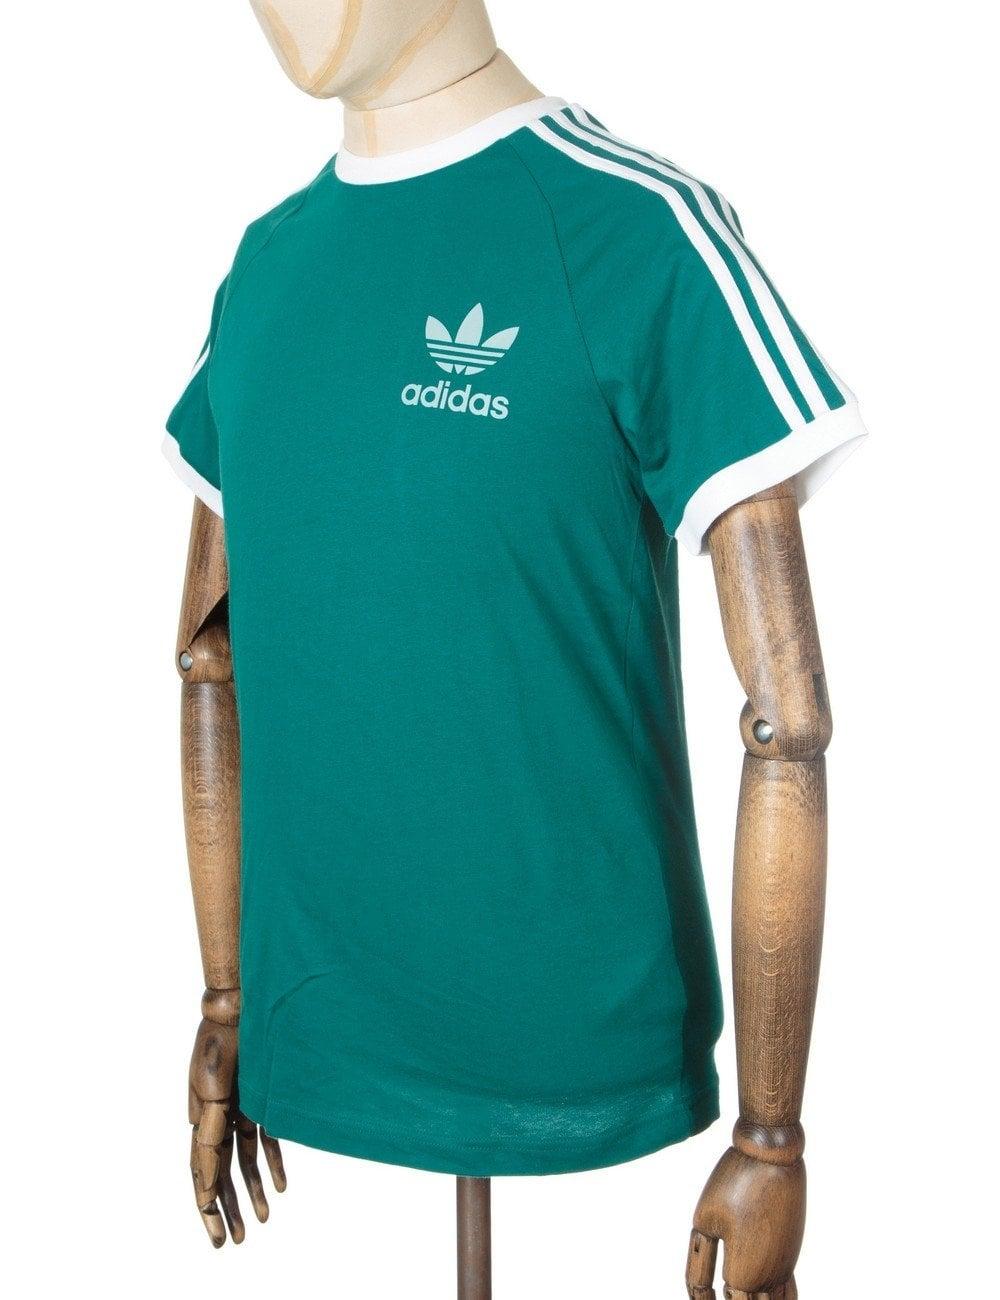 adidas california t shirt emerald